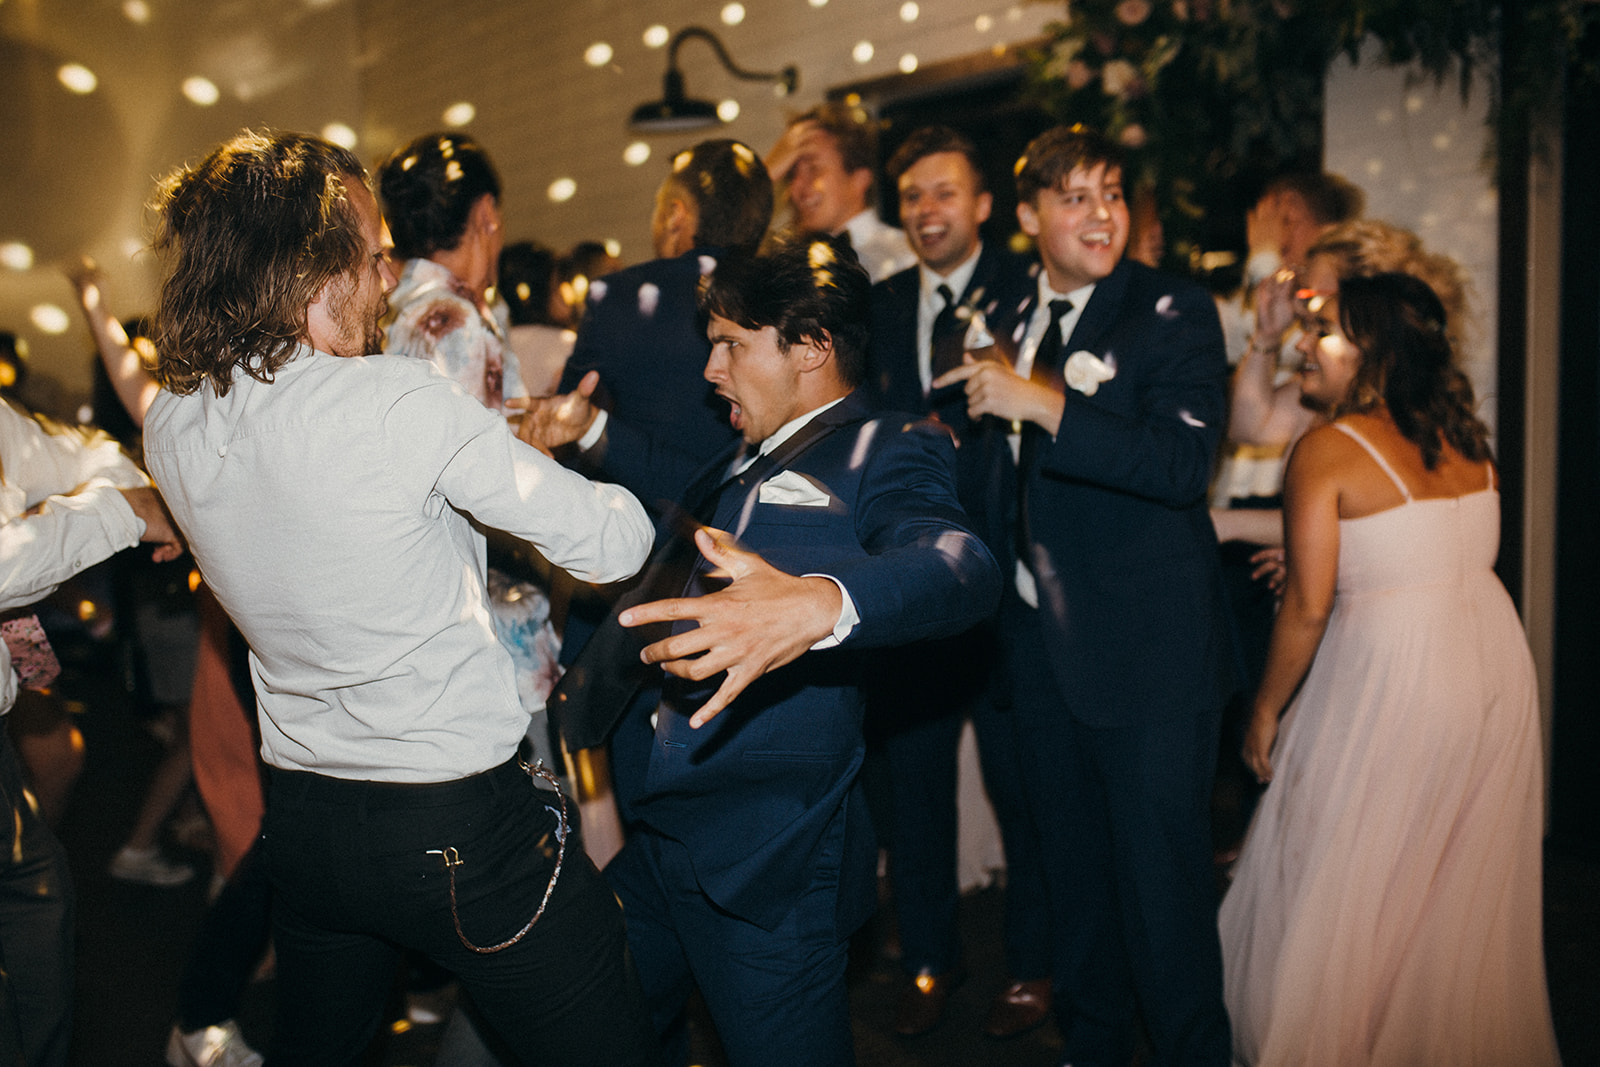 kaden_justine_wedding_5600.jpg